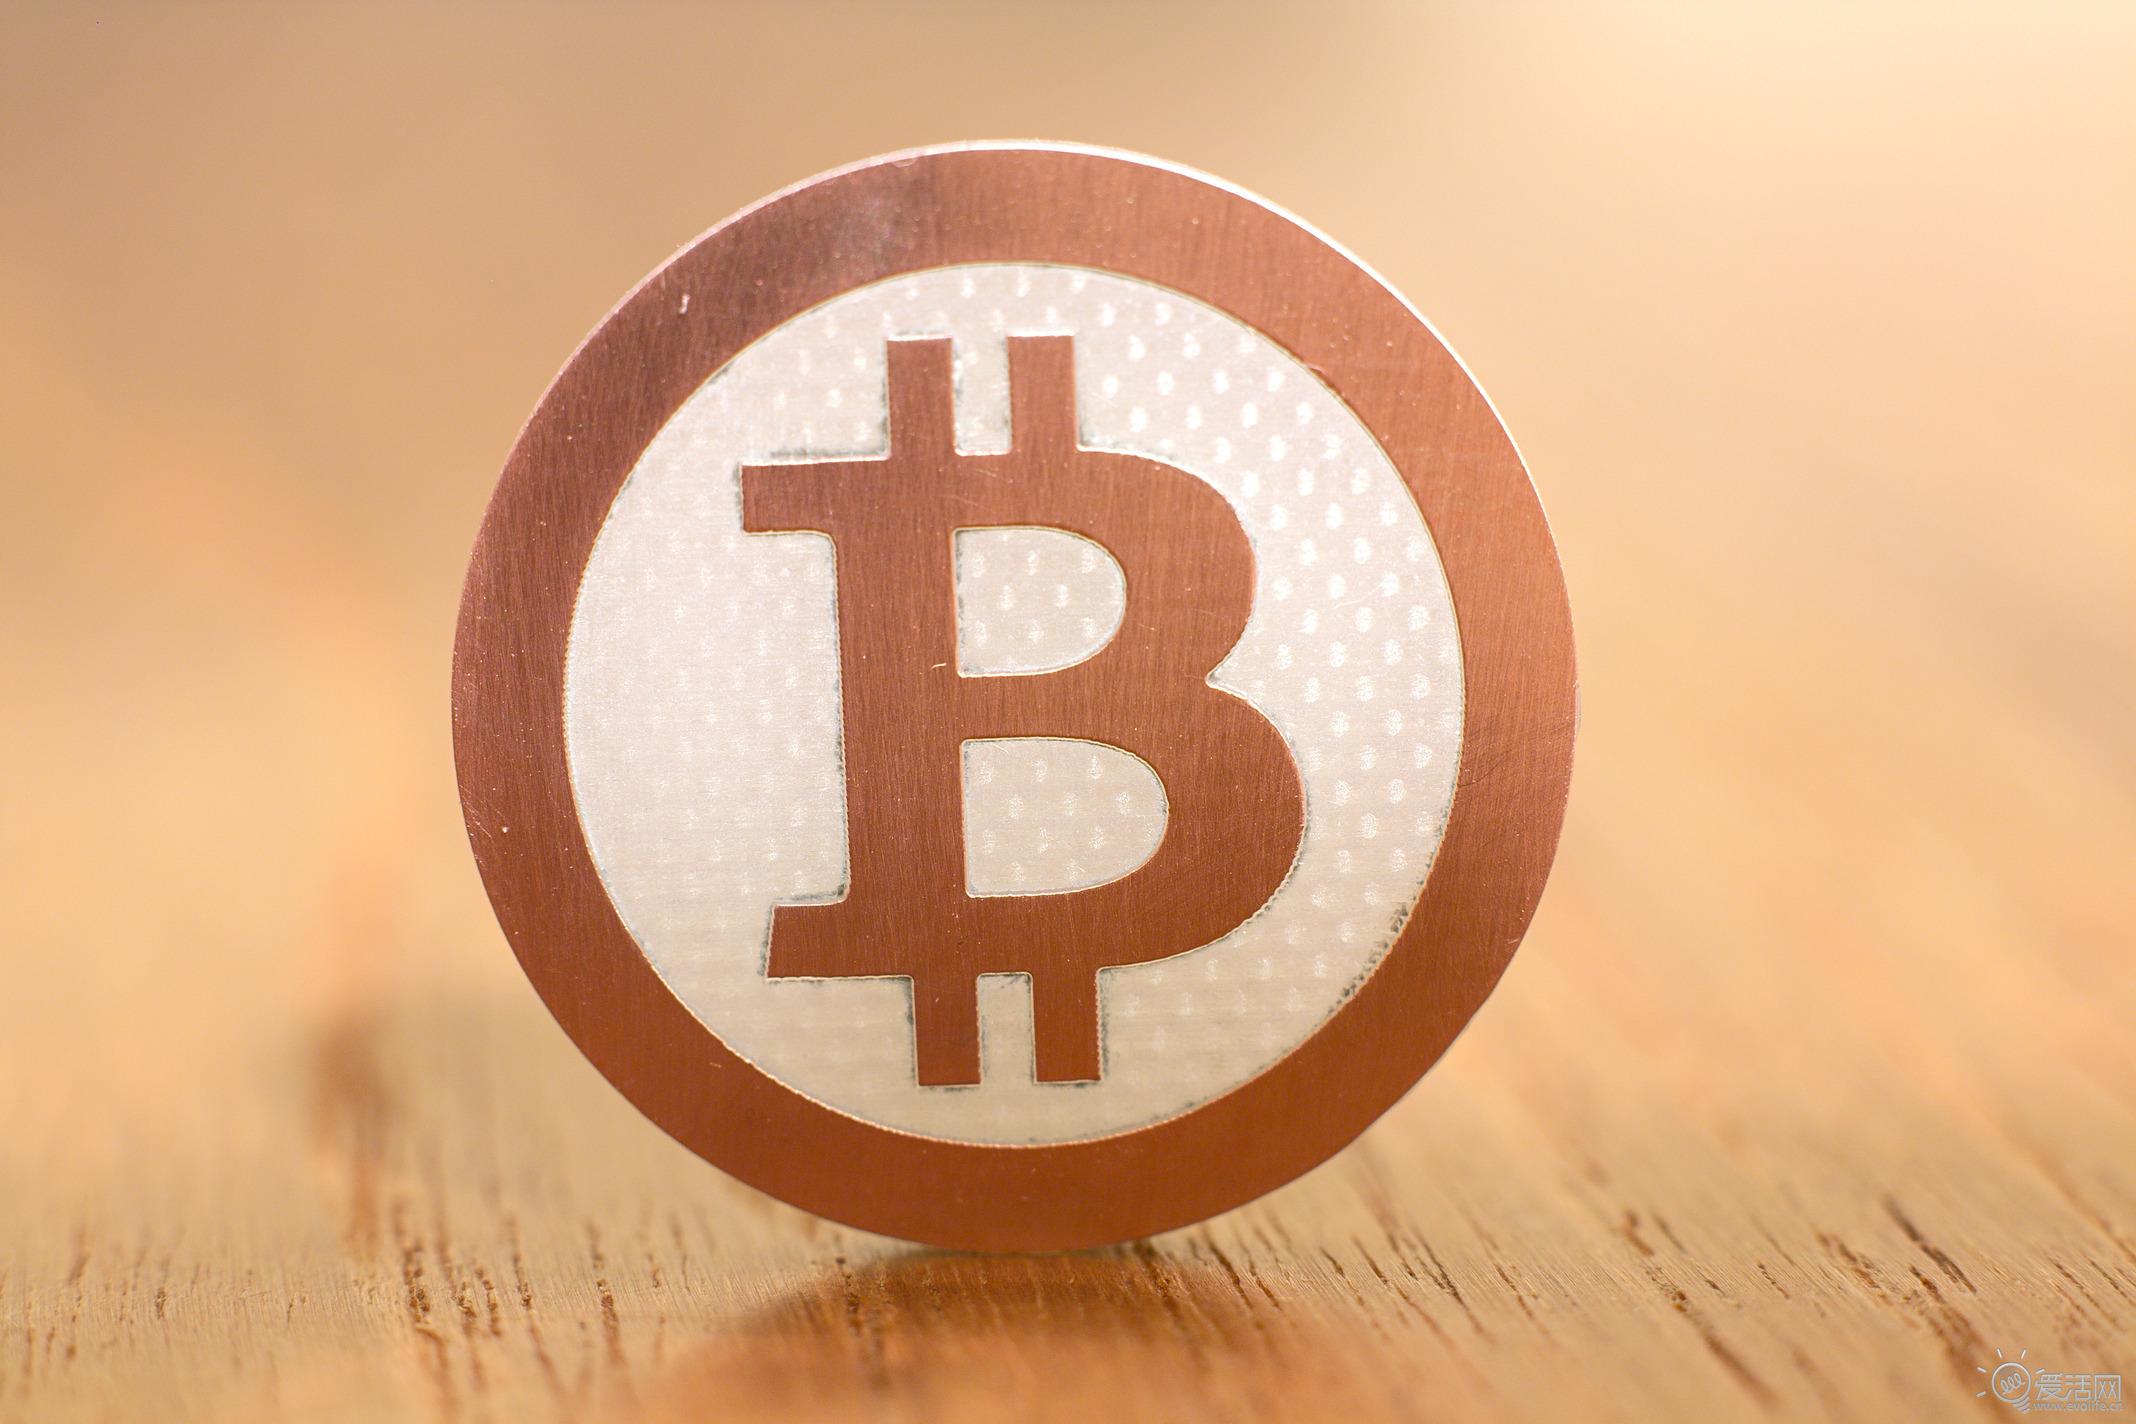 BitInka宣布推出比特币支付应用程序